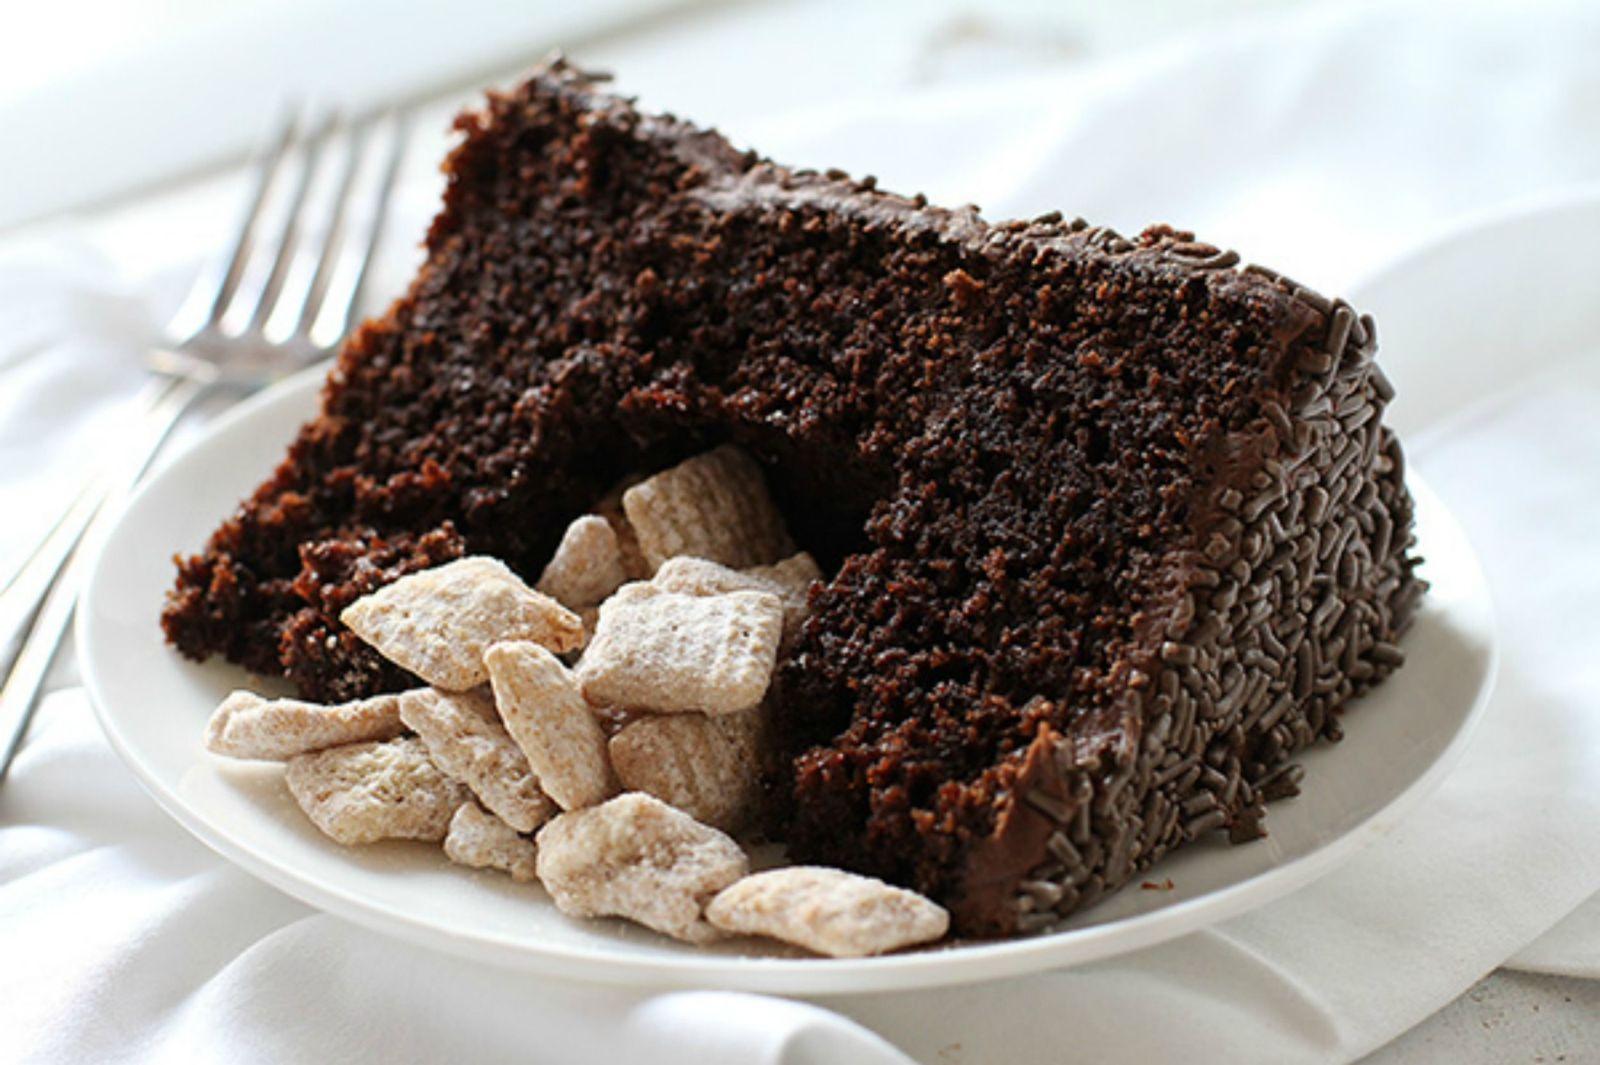 20 Sugar-Free Dessert Recipes - Naturally Sweetened Dessert Recipes